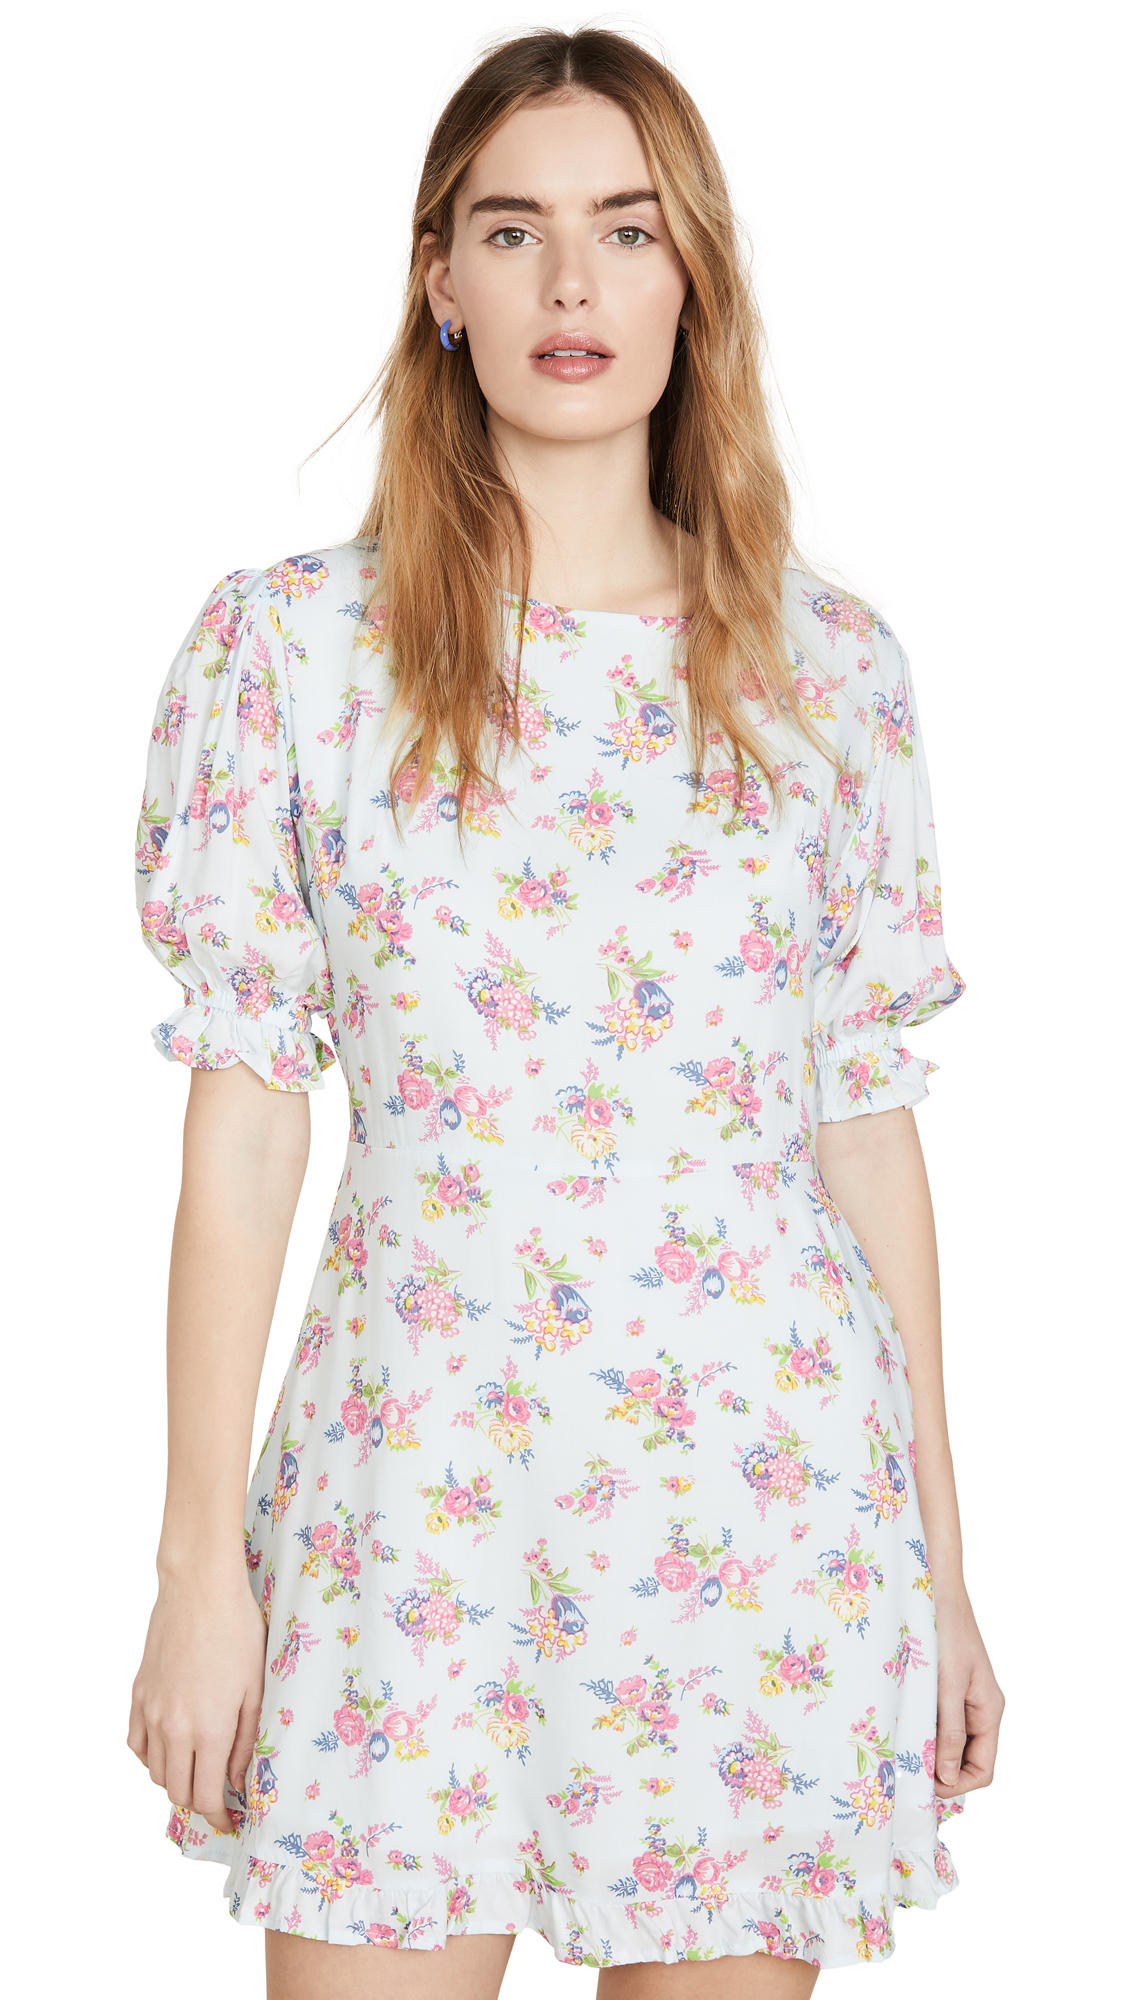 FAITHFULL THE BRAND Florence Mini Dress - 40% Off Sale